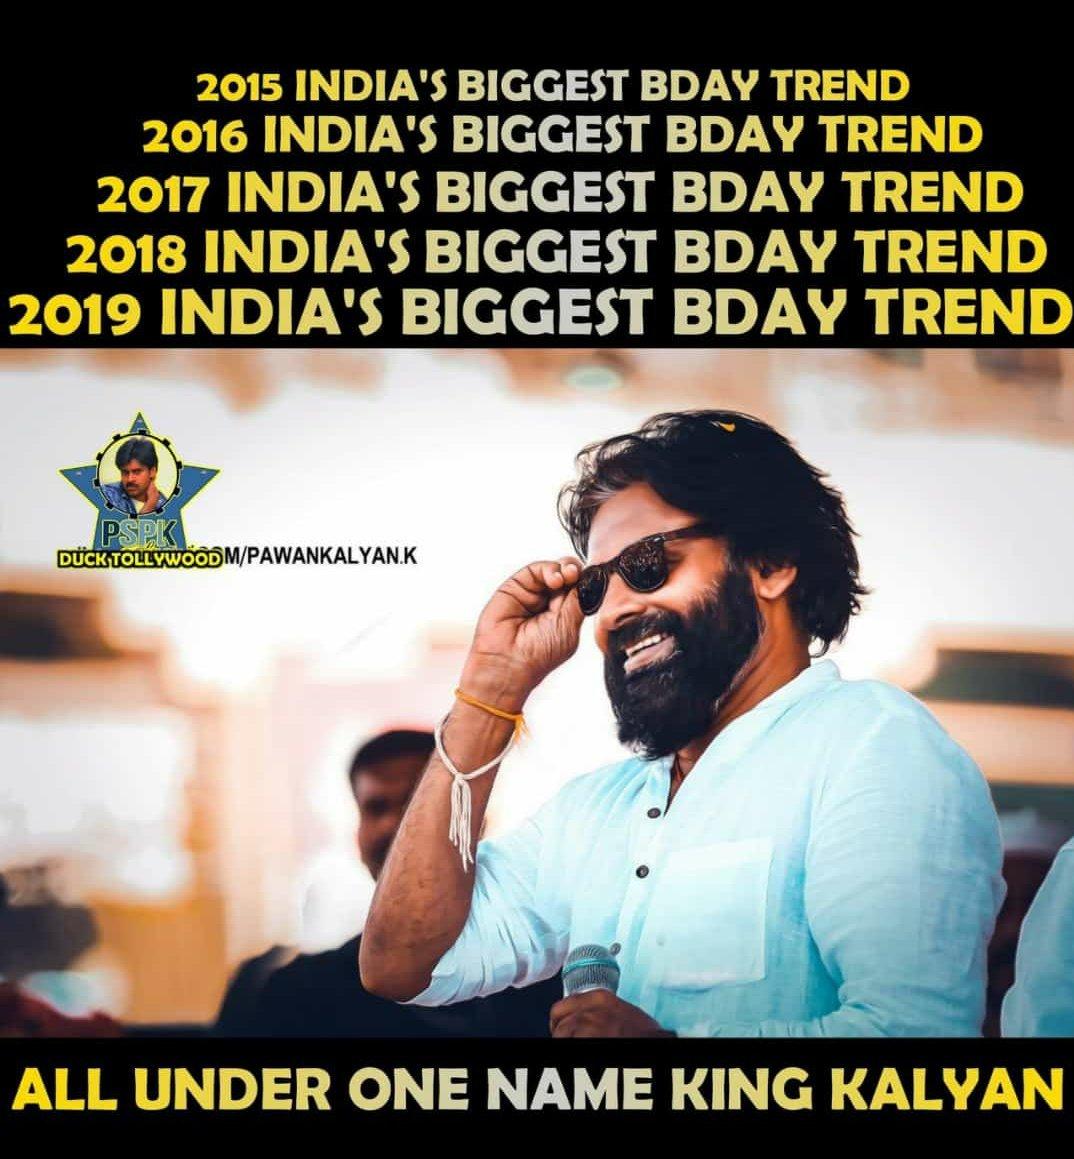 Top 5 Birthday Trends in India   1. #HappyBirthdayPawanKalyan : 10.5M+ (2019)   2. #HappyBirthdaySSMB : 8.3M ('19)   3. #HBDJanaSenaniPawanKalyan 7.4M ('18)   4. #HBDSuperstarMAHESH : 4.5M ('18)   5. #HappyBirthdayPrabhas : 4.2M ('18)   #Prabhas bday '19 tag same as 18. Count??<br>http://pic.twitter.com/GCyAli1o0U